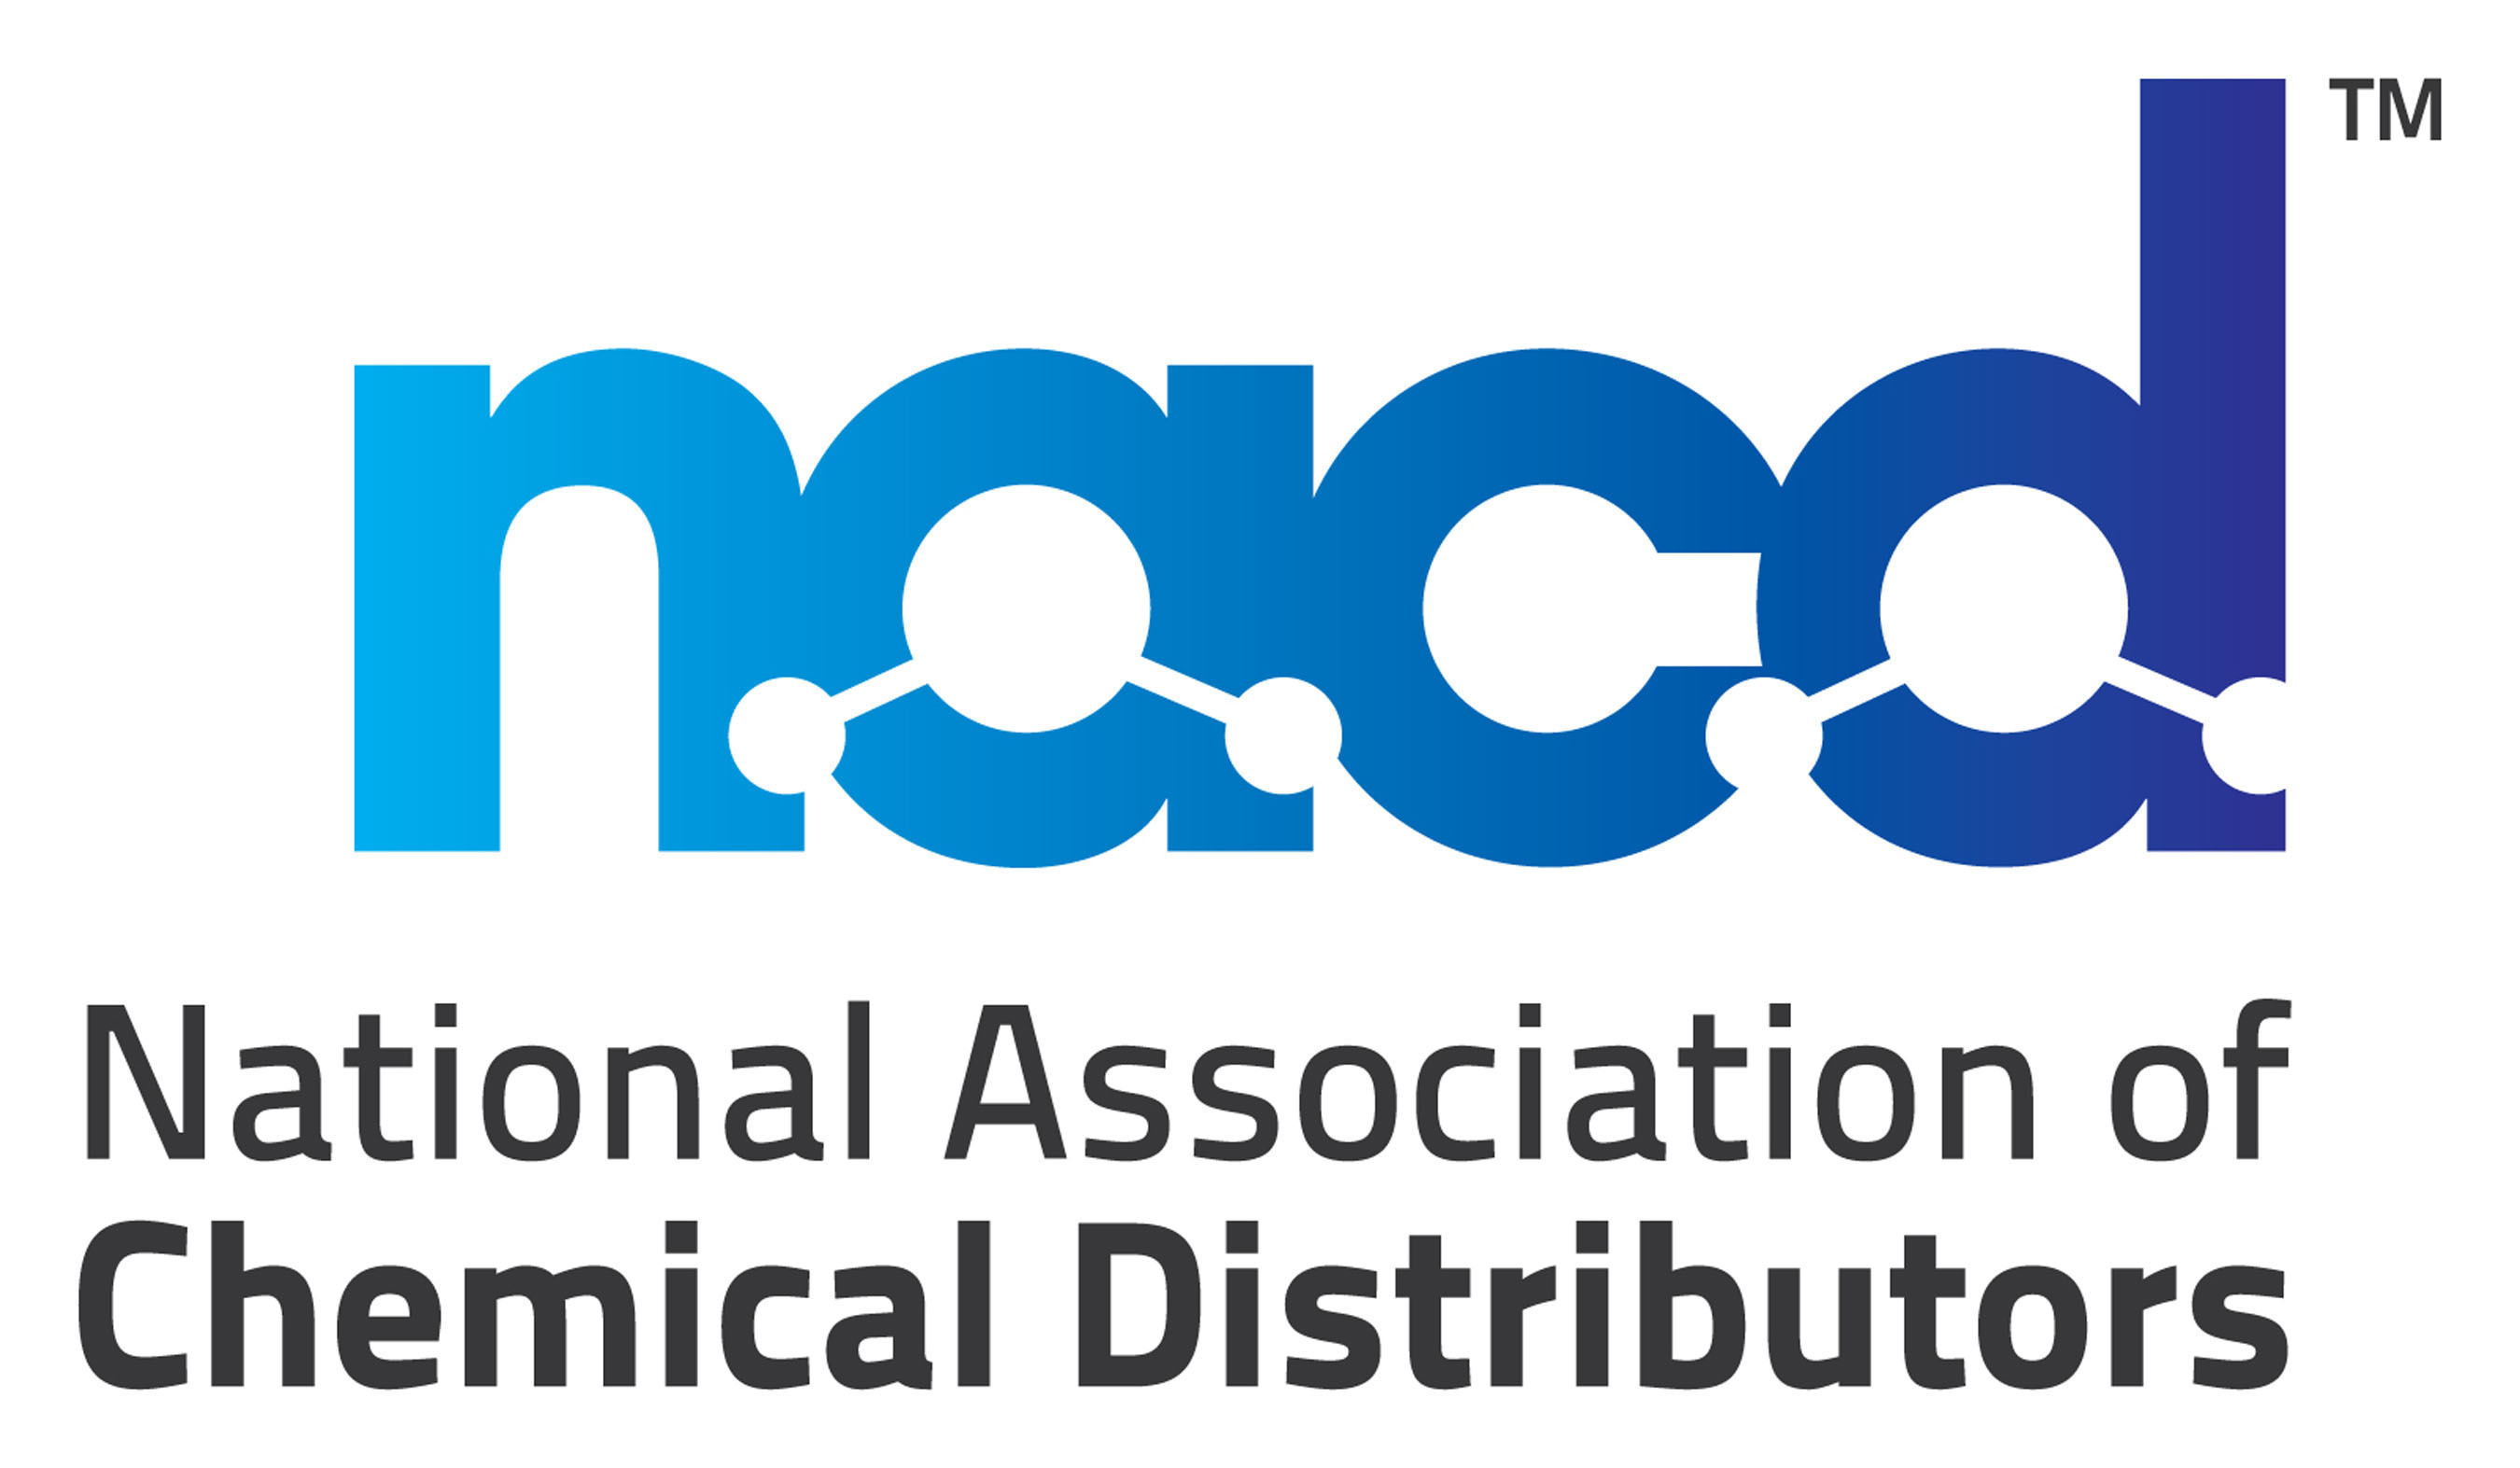 NATIONAL ASSOCIATION OF CHEMICAL DISTRIBUTORS (NACD).